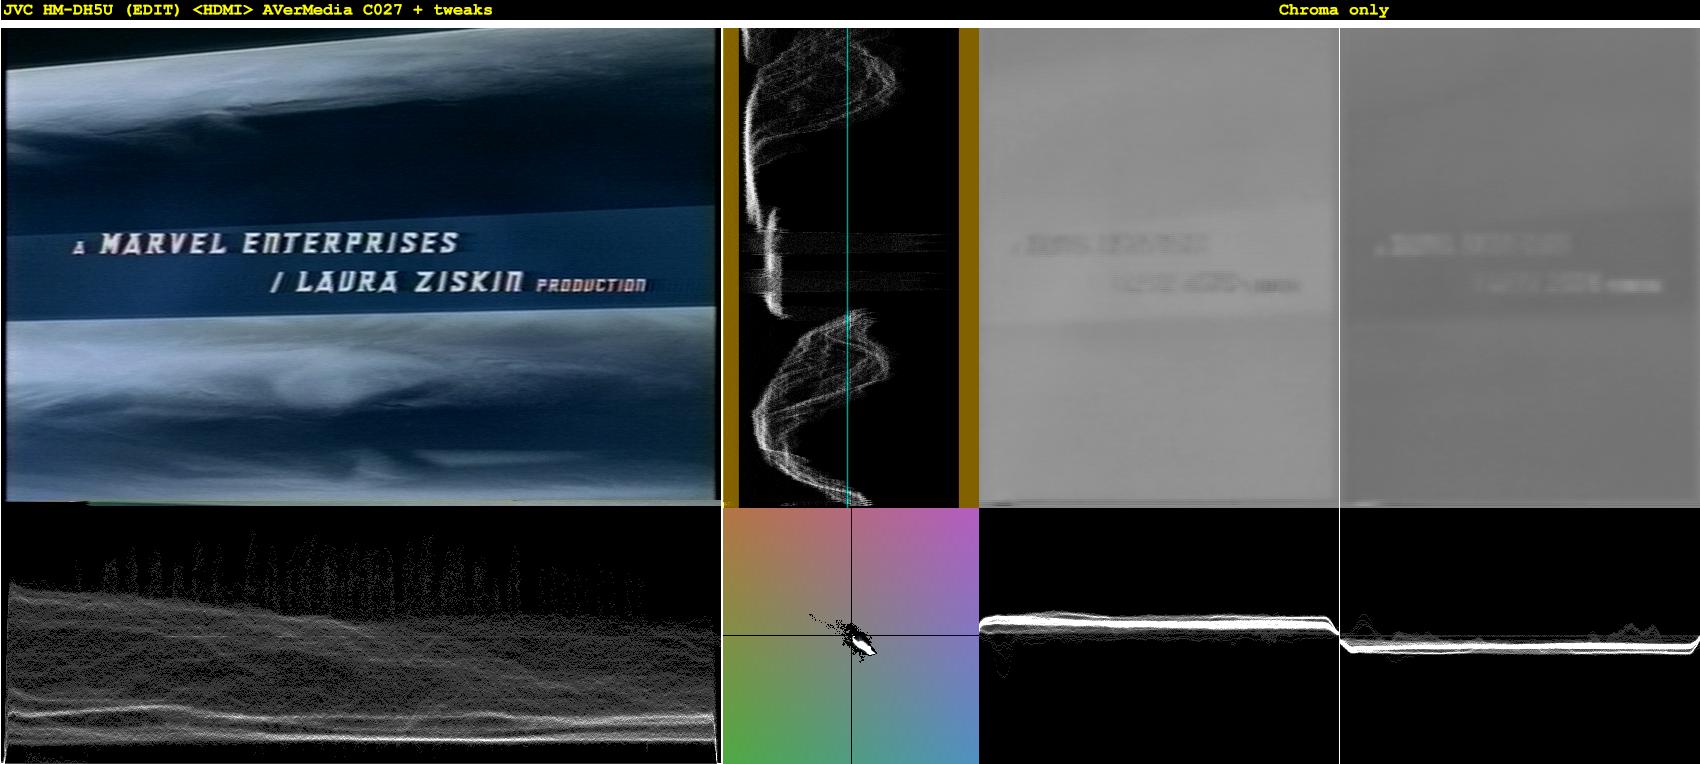 Click image for larger version  Name:0-09-01 - JVC HM-DH5U (EDIT).png Views:1064 Size:818.6 KB ID:37666